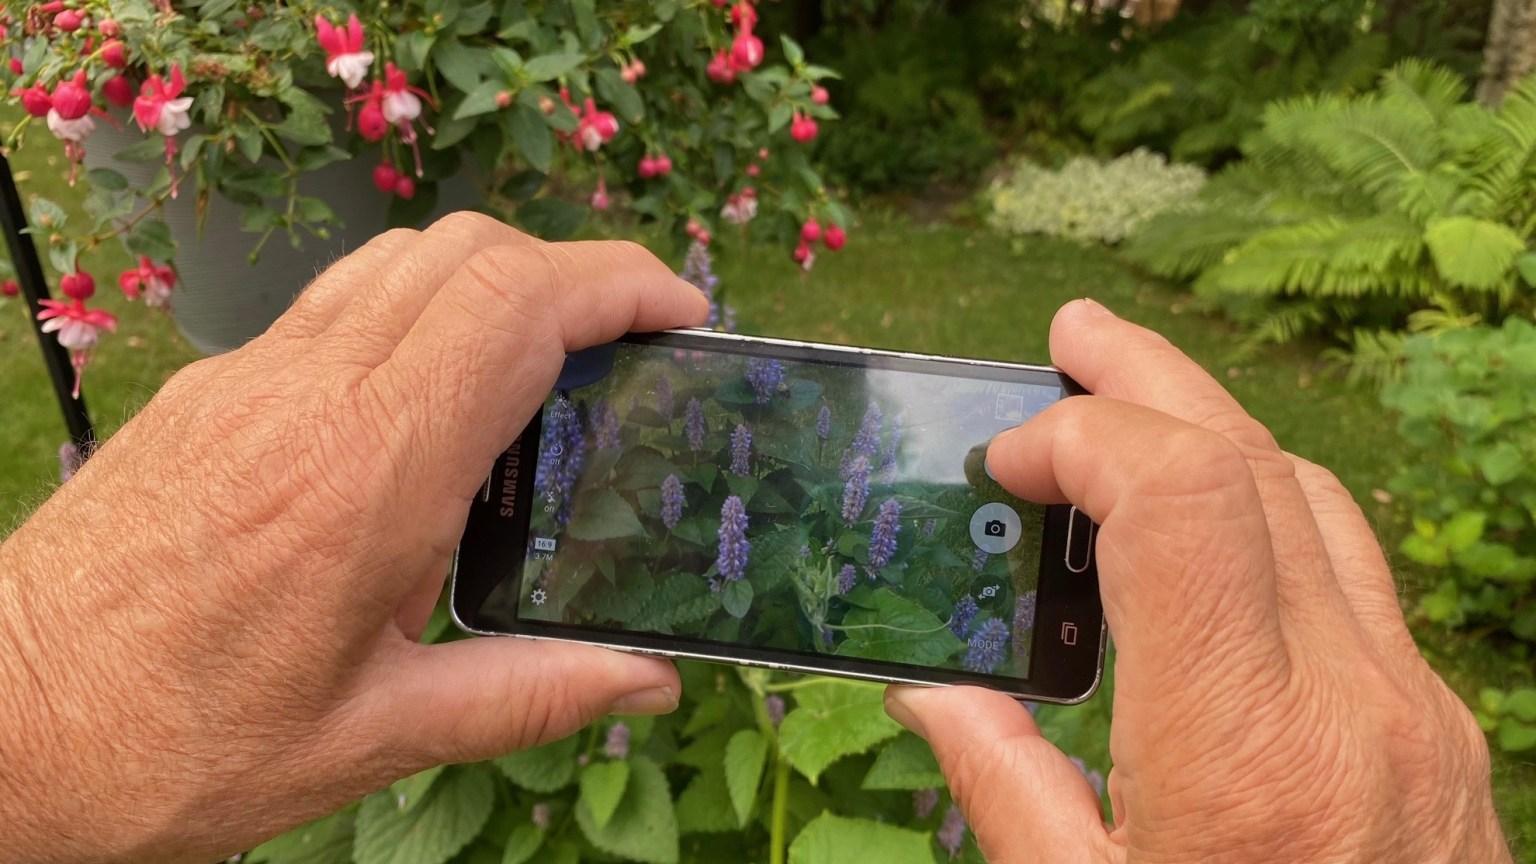 c/u of phone video cam of flowers